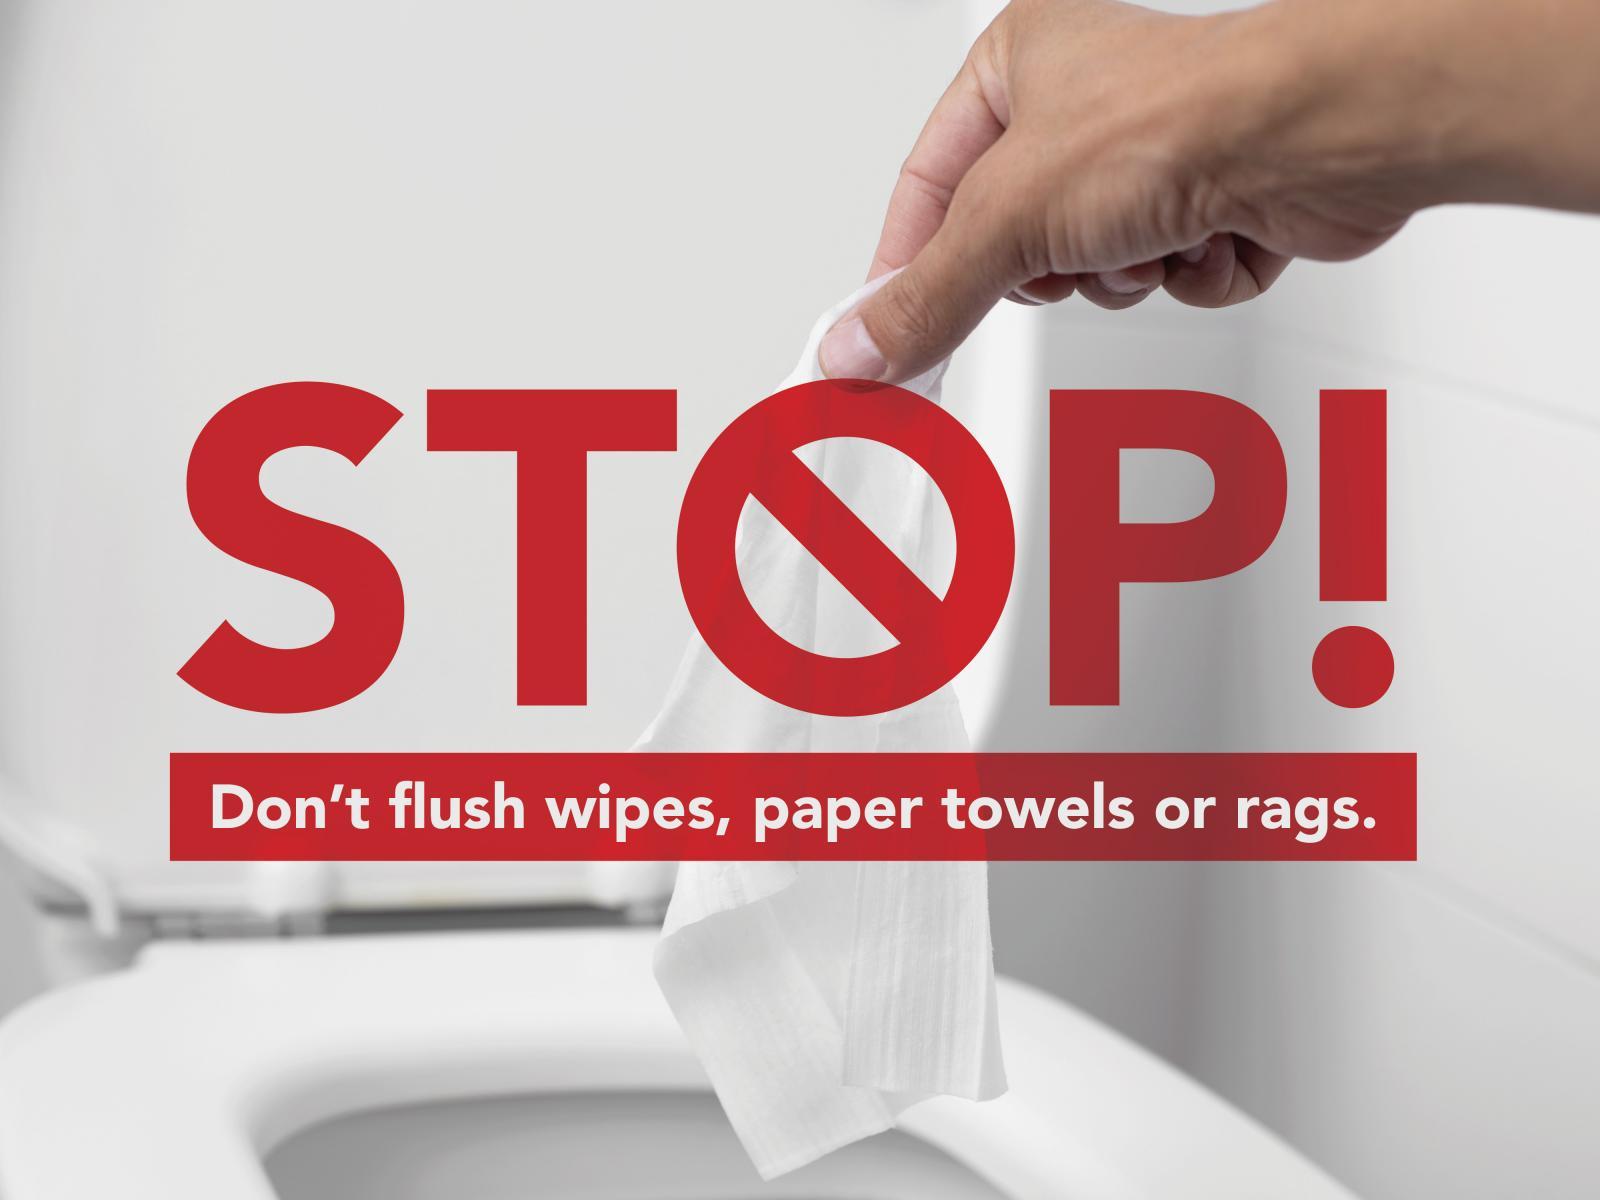 Don't flush wipes image